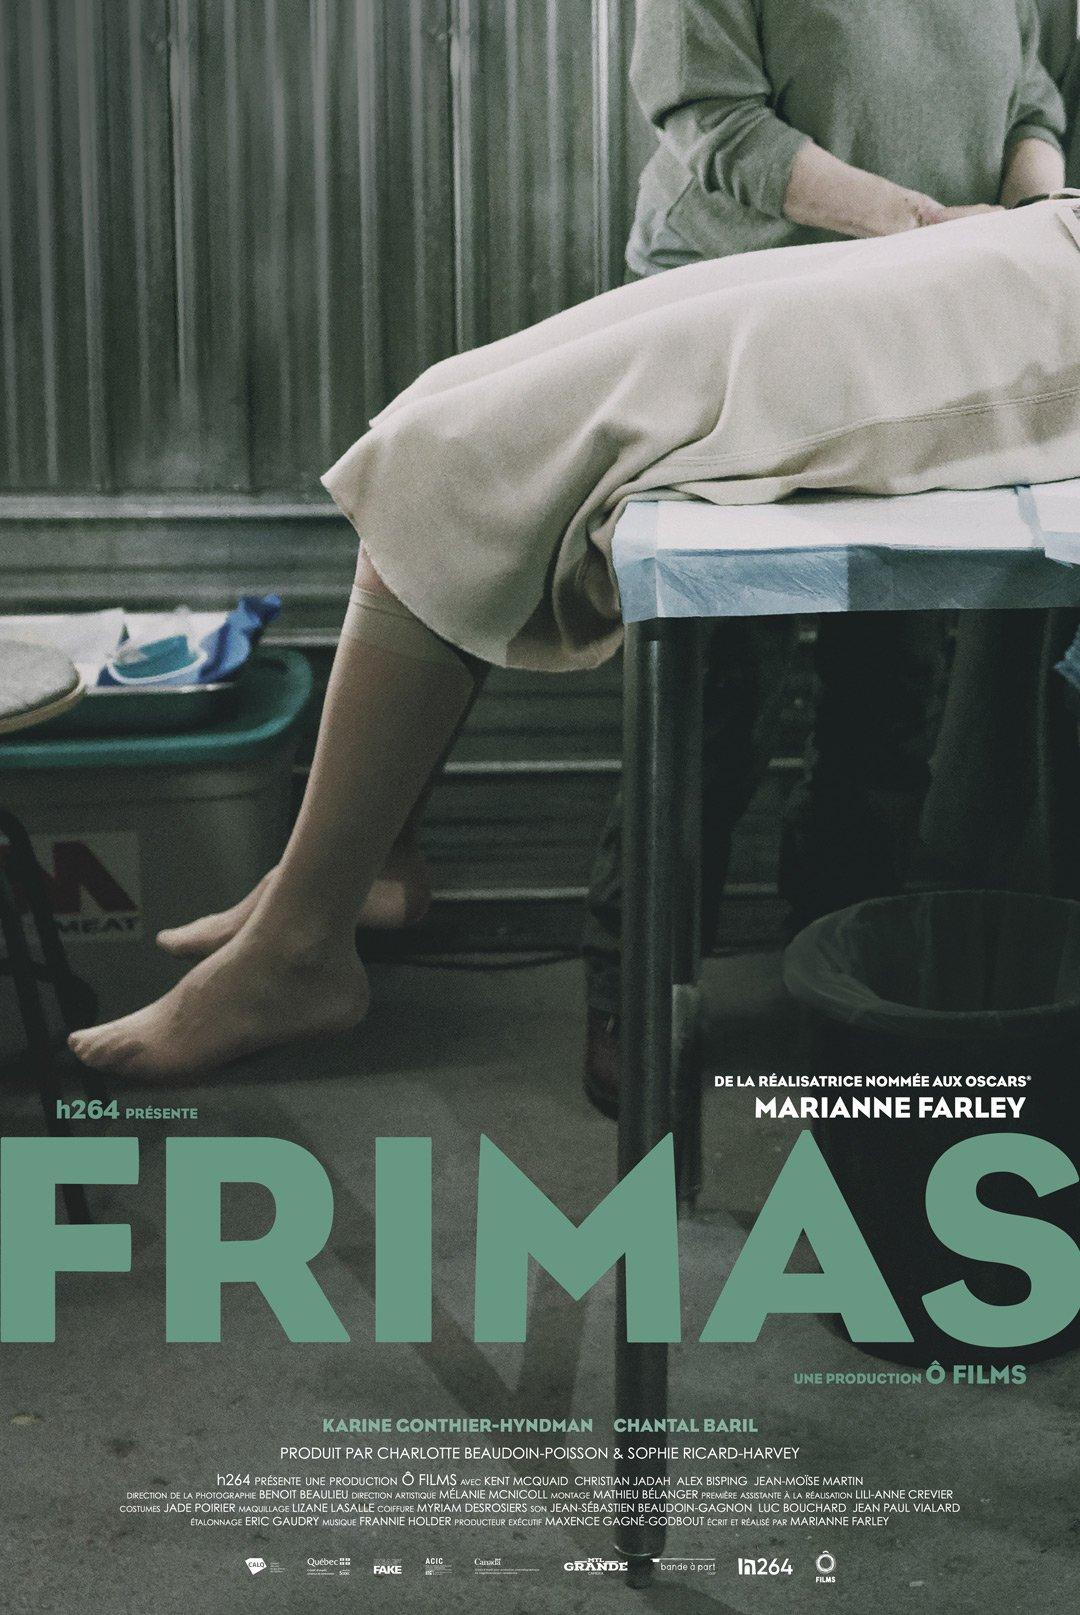 Frimas - Un film de Marianne Farley - Affiche